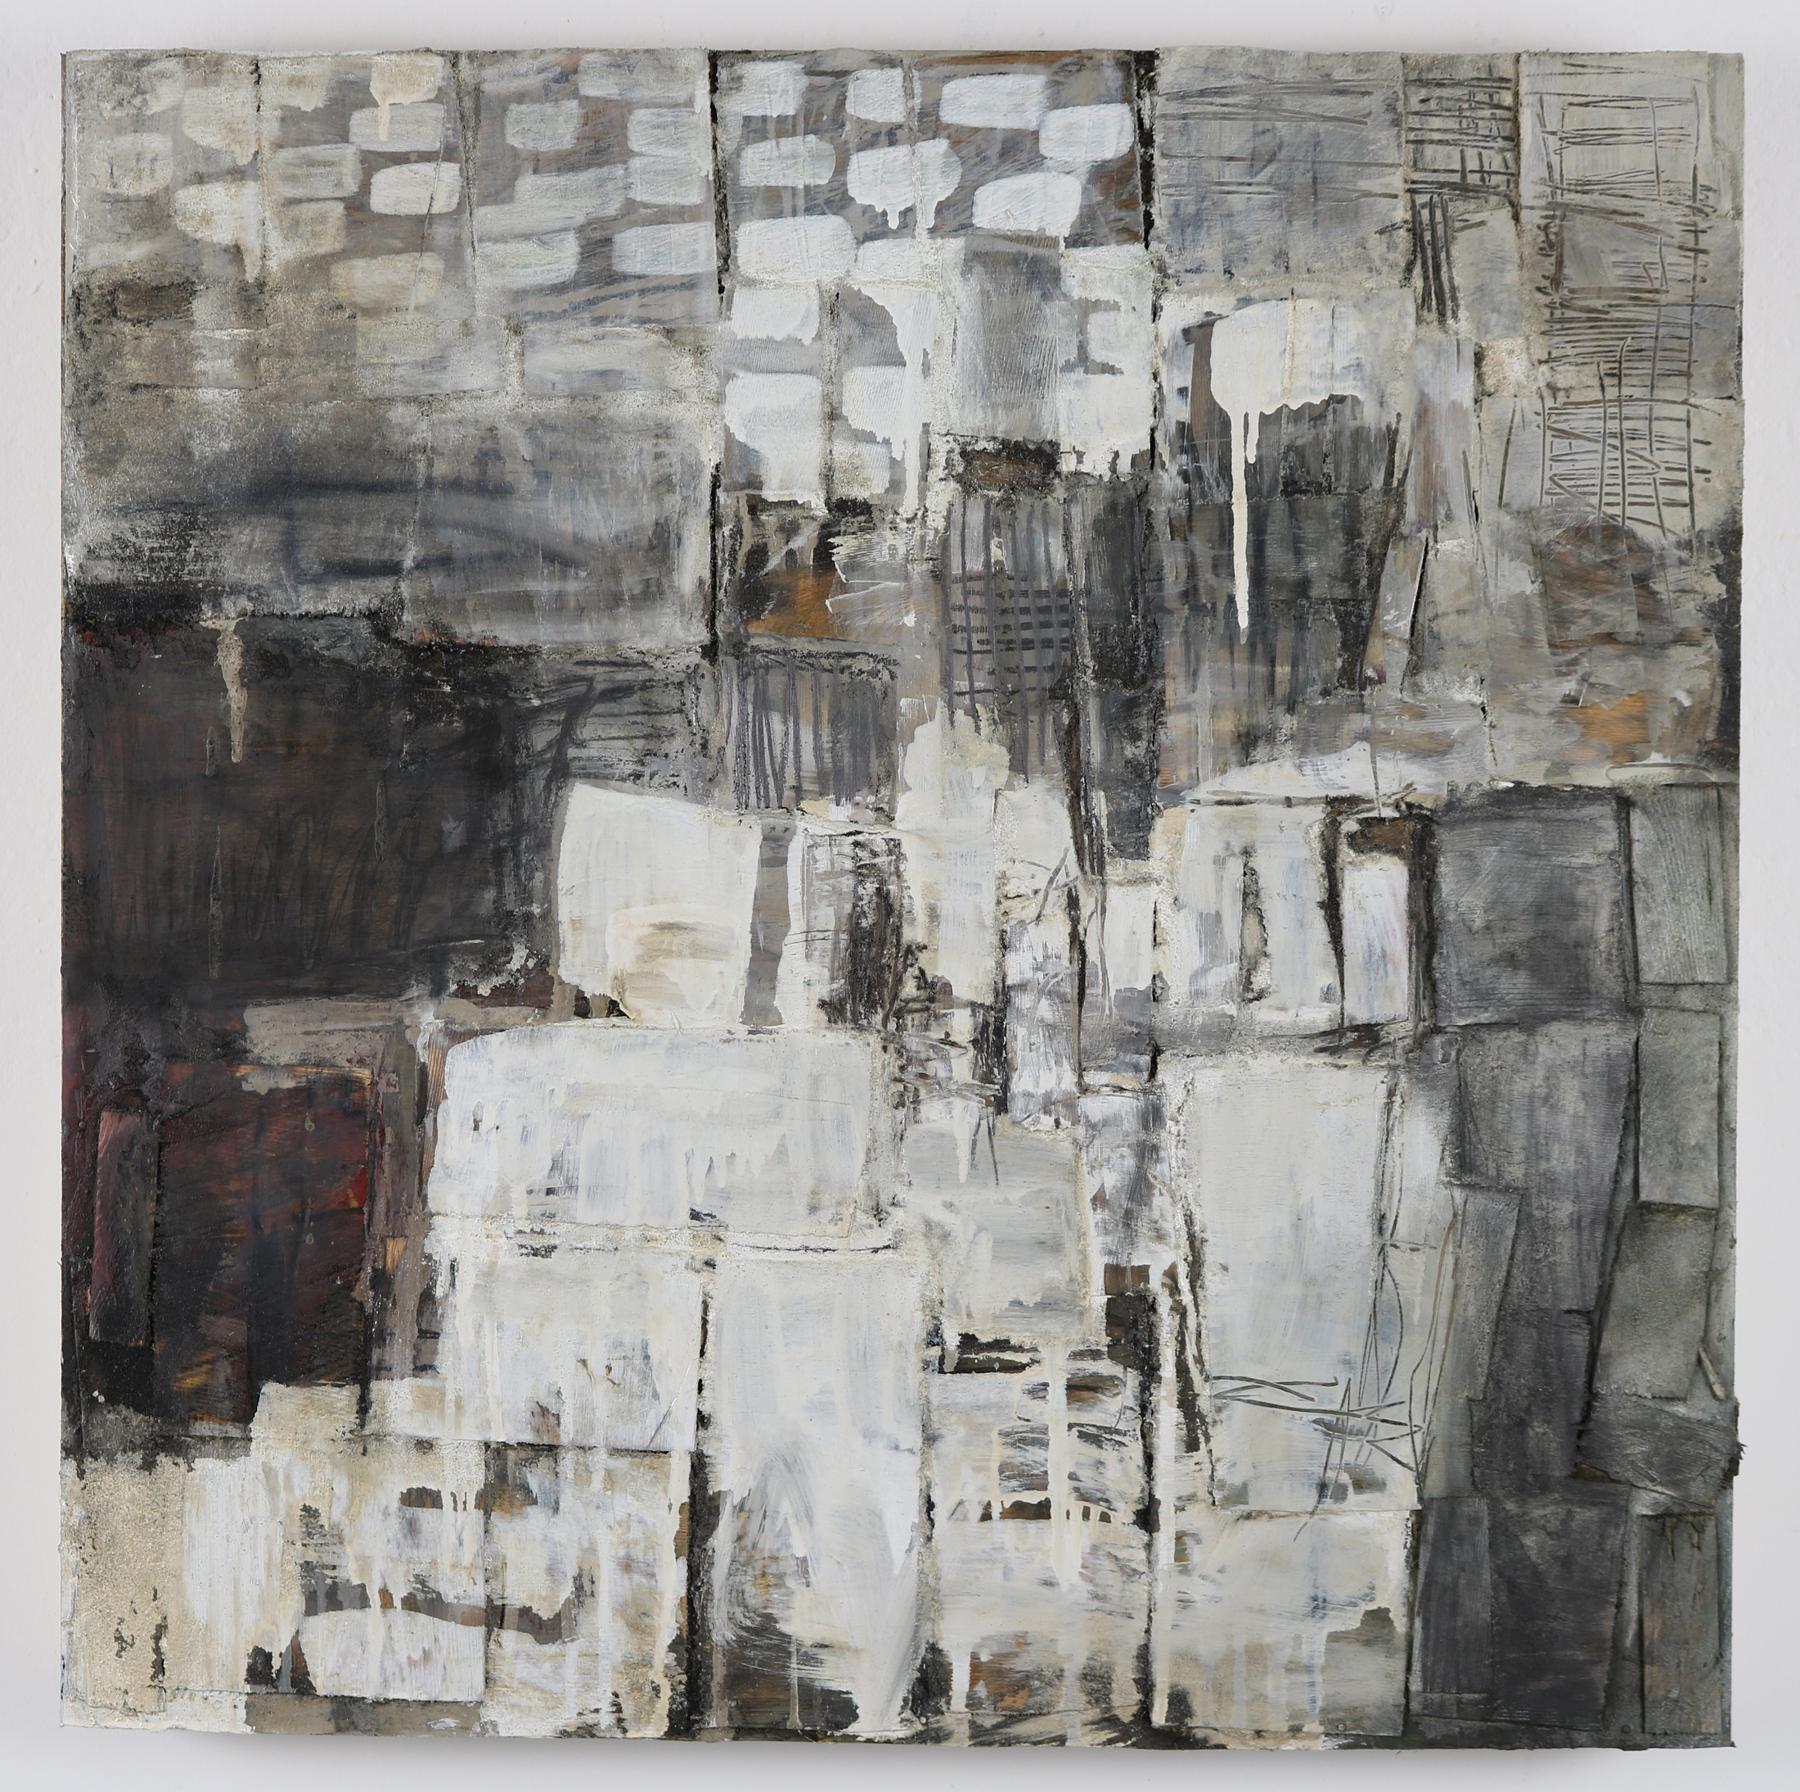 Leslie Zelamsky,  Dwelling IV , Mixed media, 24x24